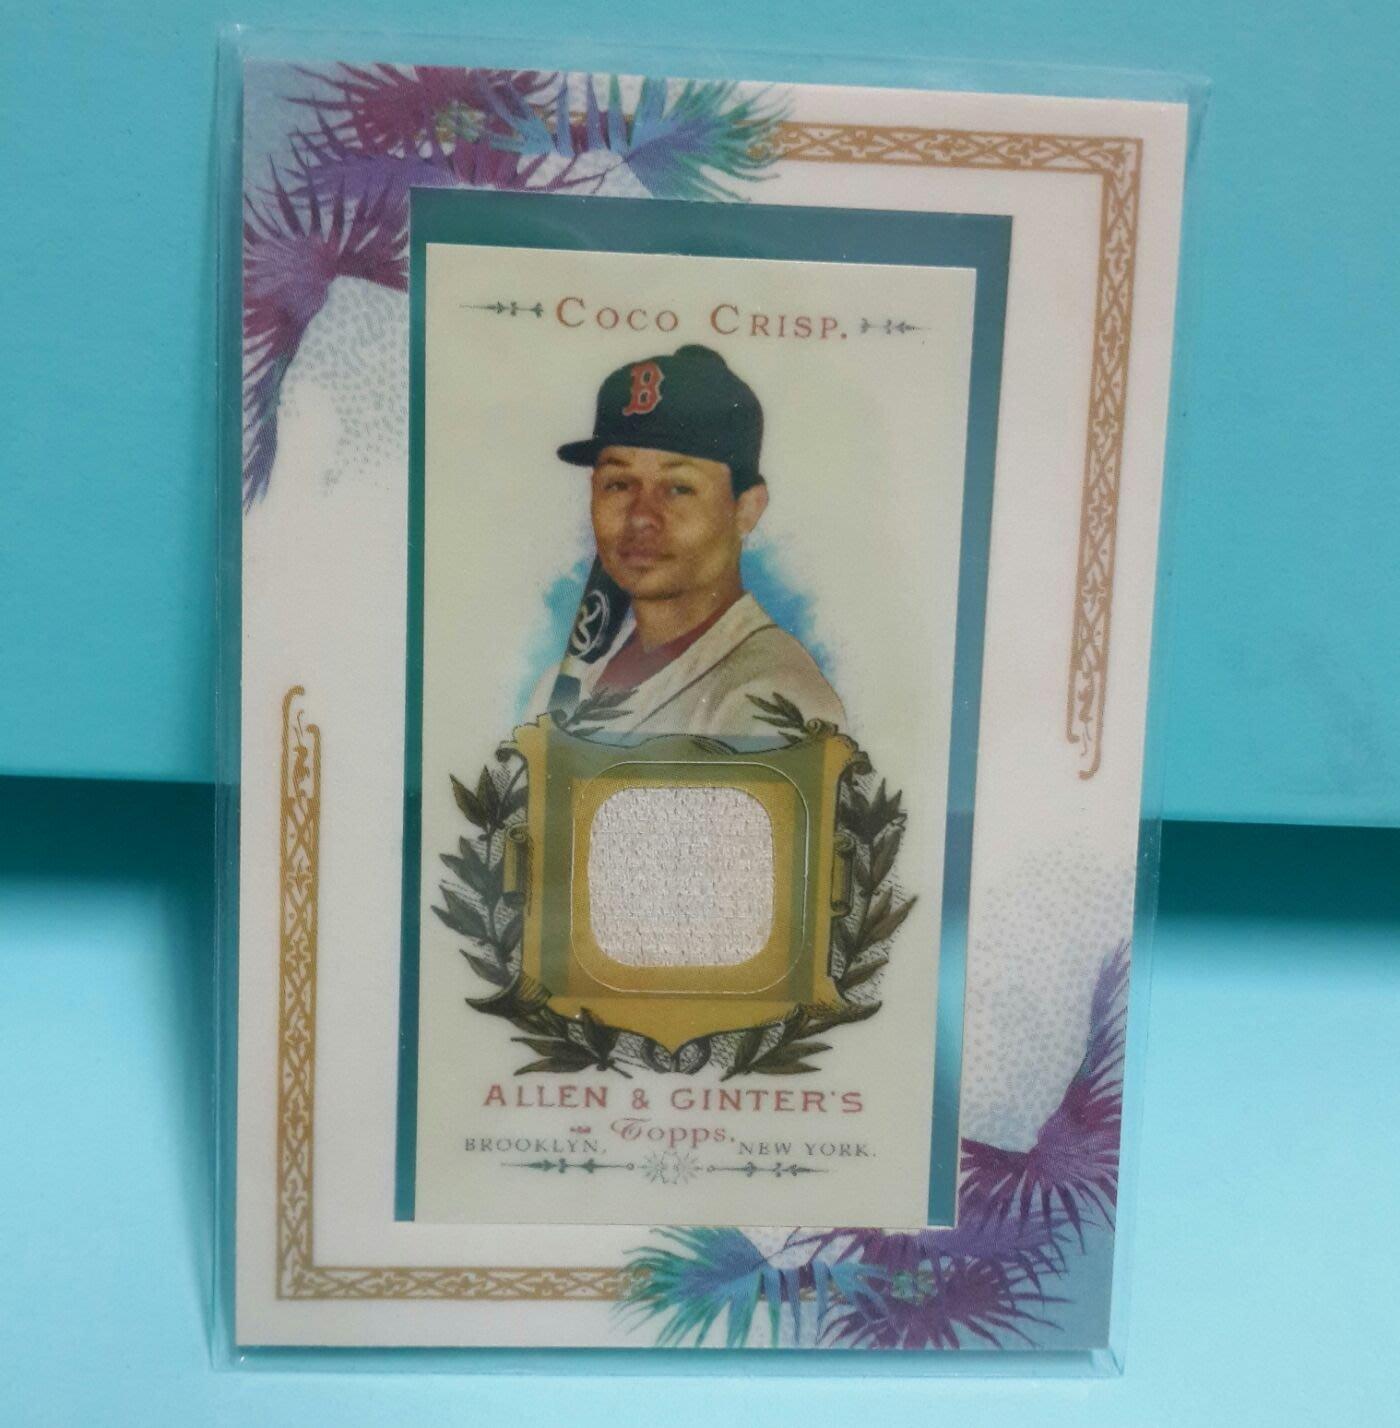 2007 Coco CRISP波士頓紅襪隊球具棒球卡